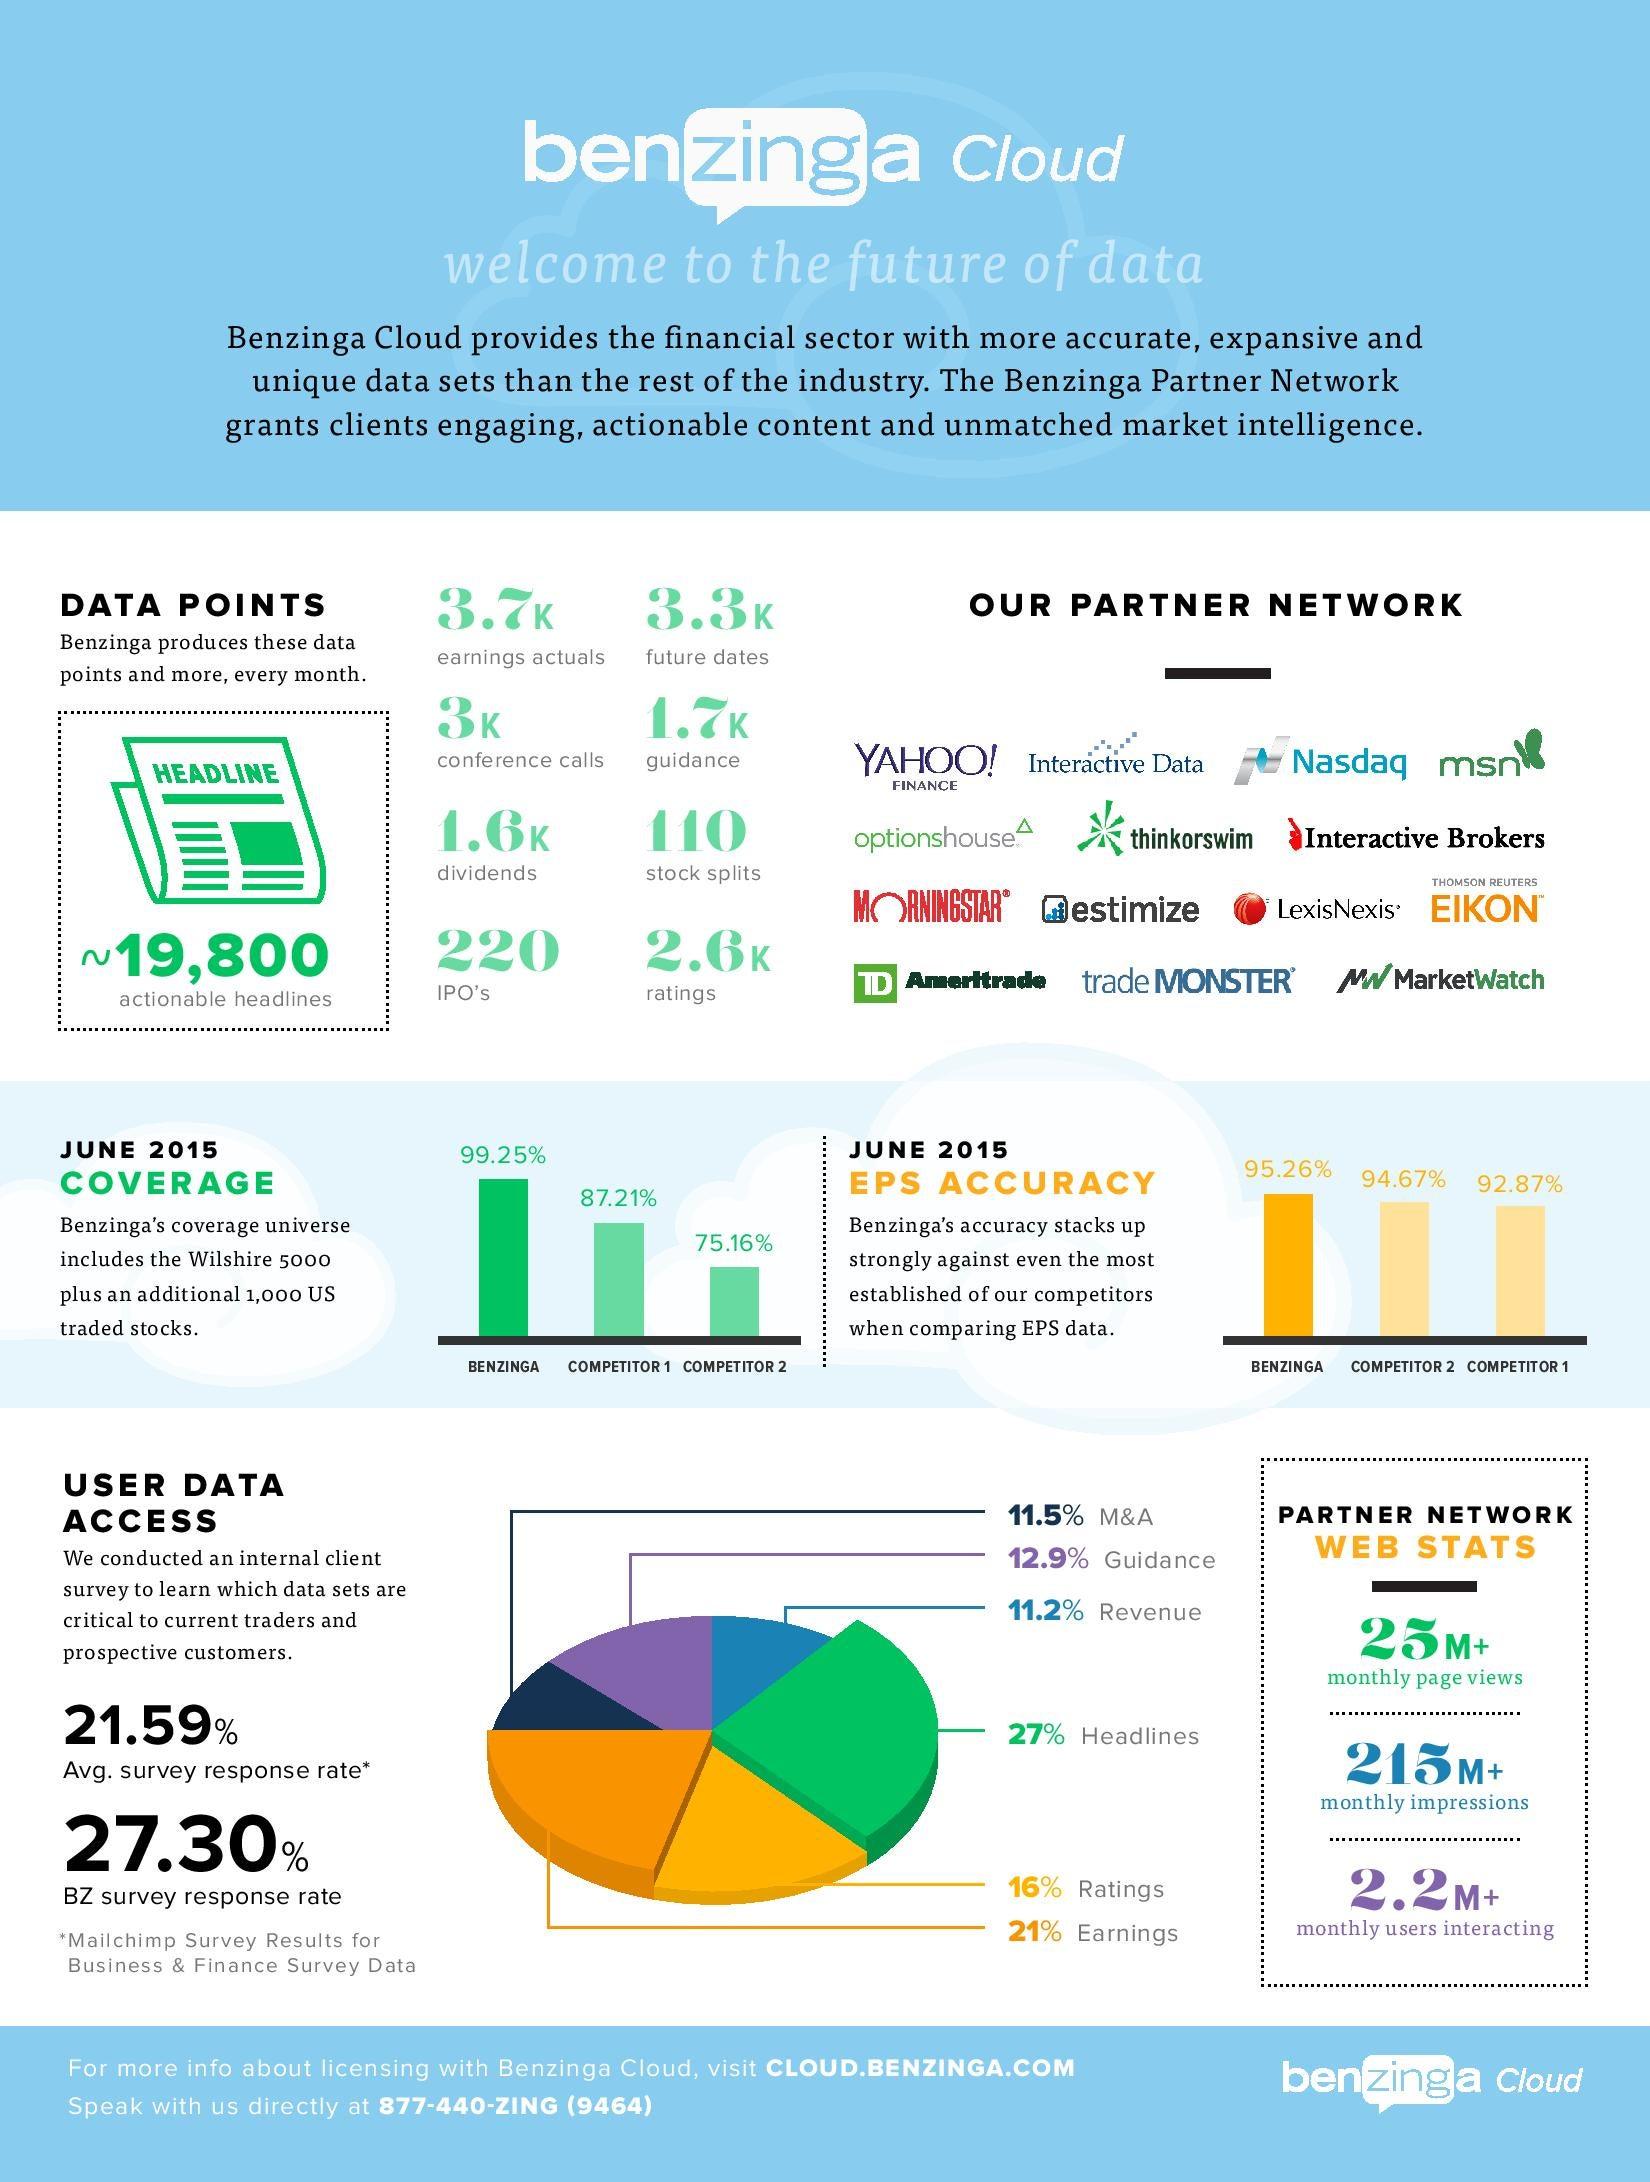 benzinga_cloud__the_future_of_data__infographic_-page-001_1.jpg